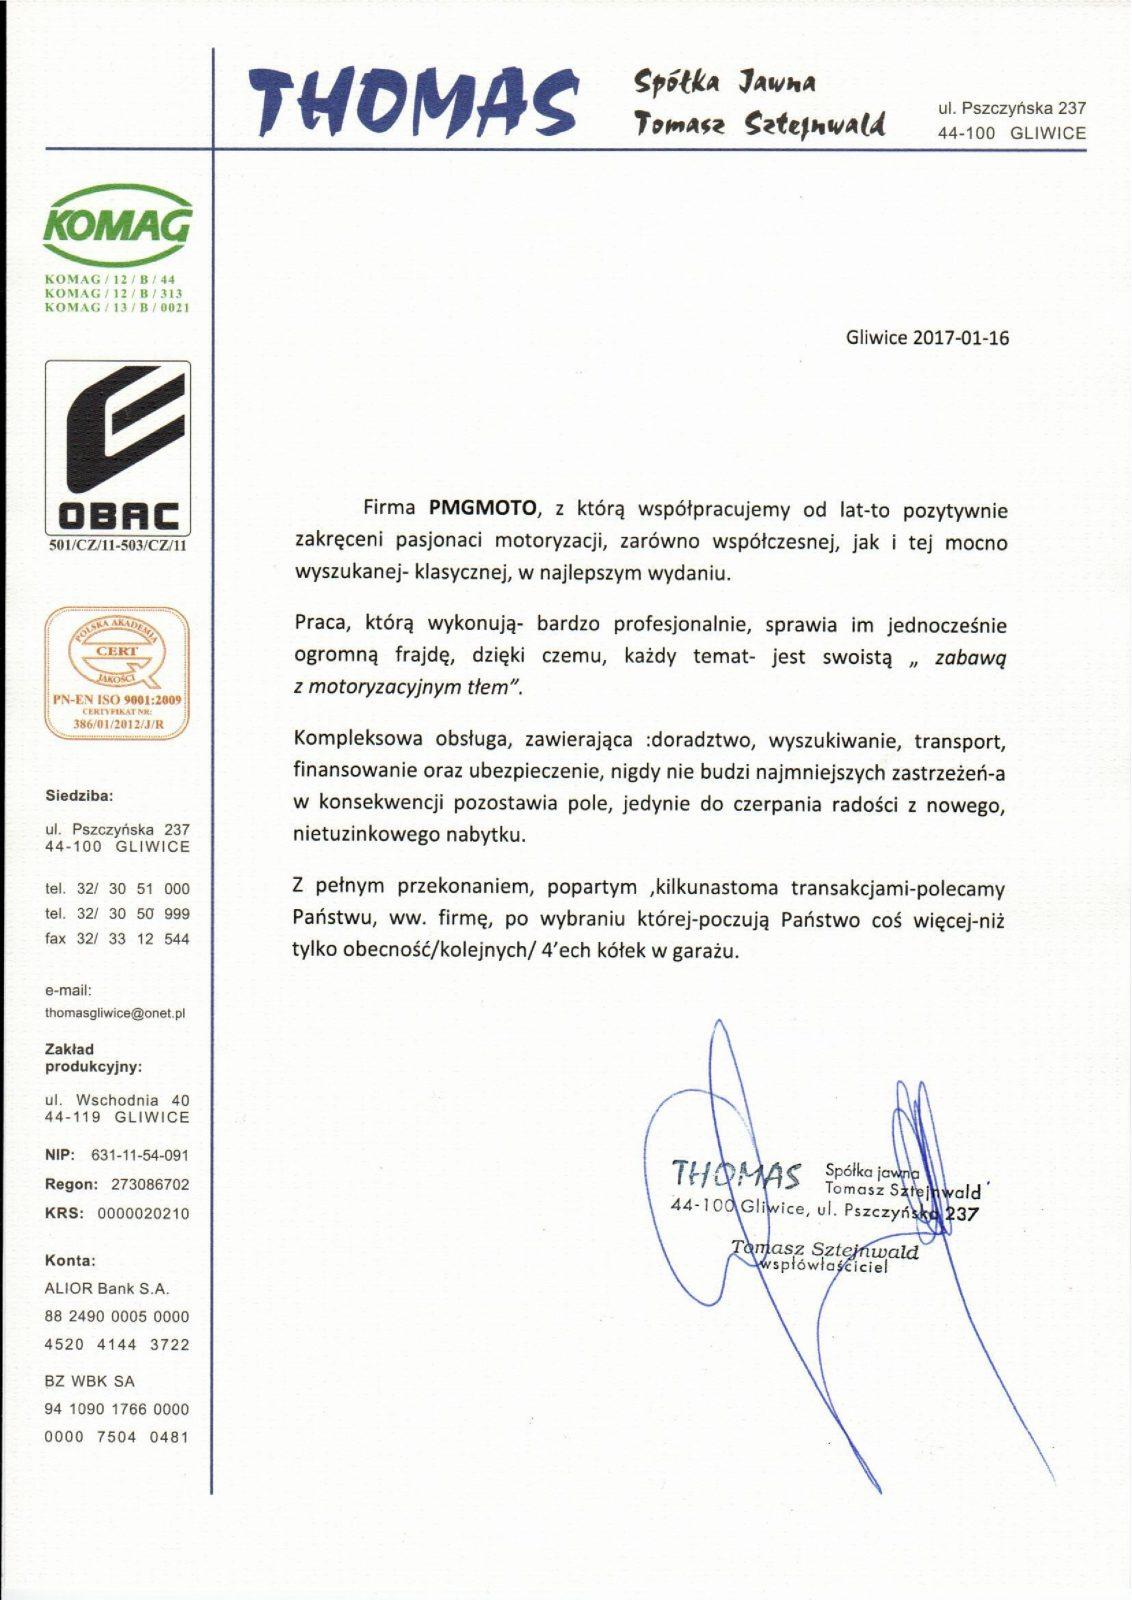 THOMAS Spółka jawna